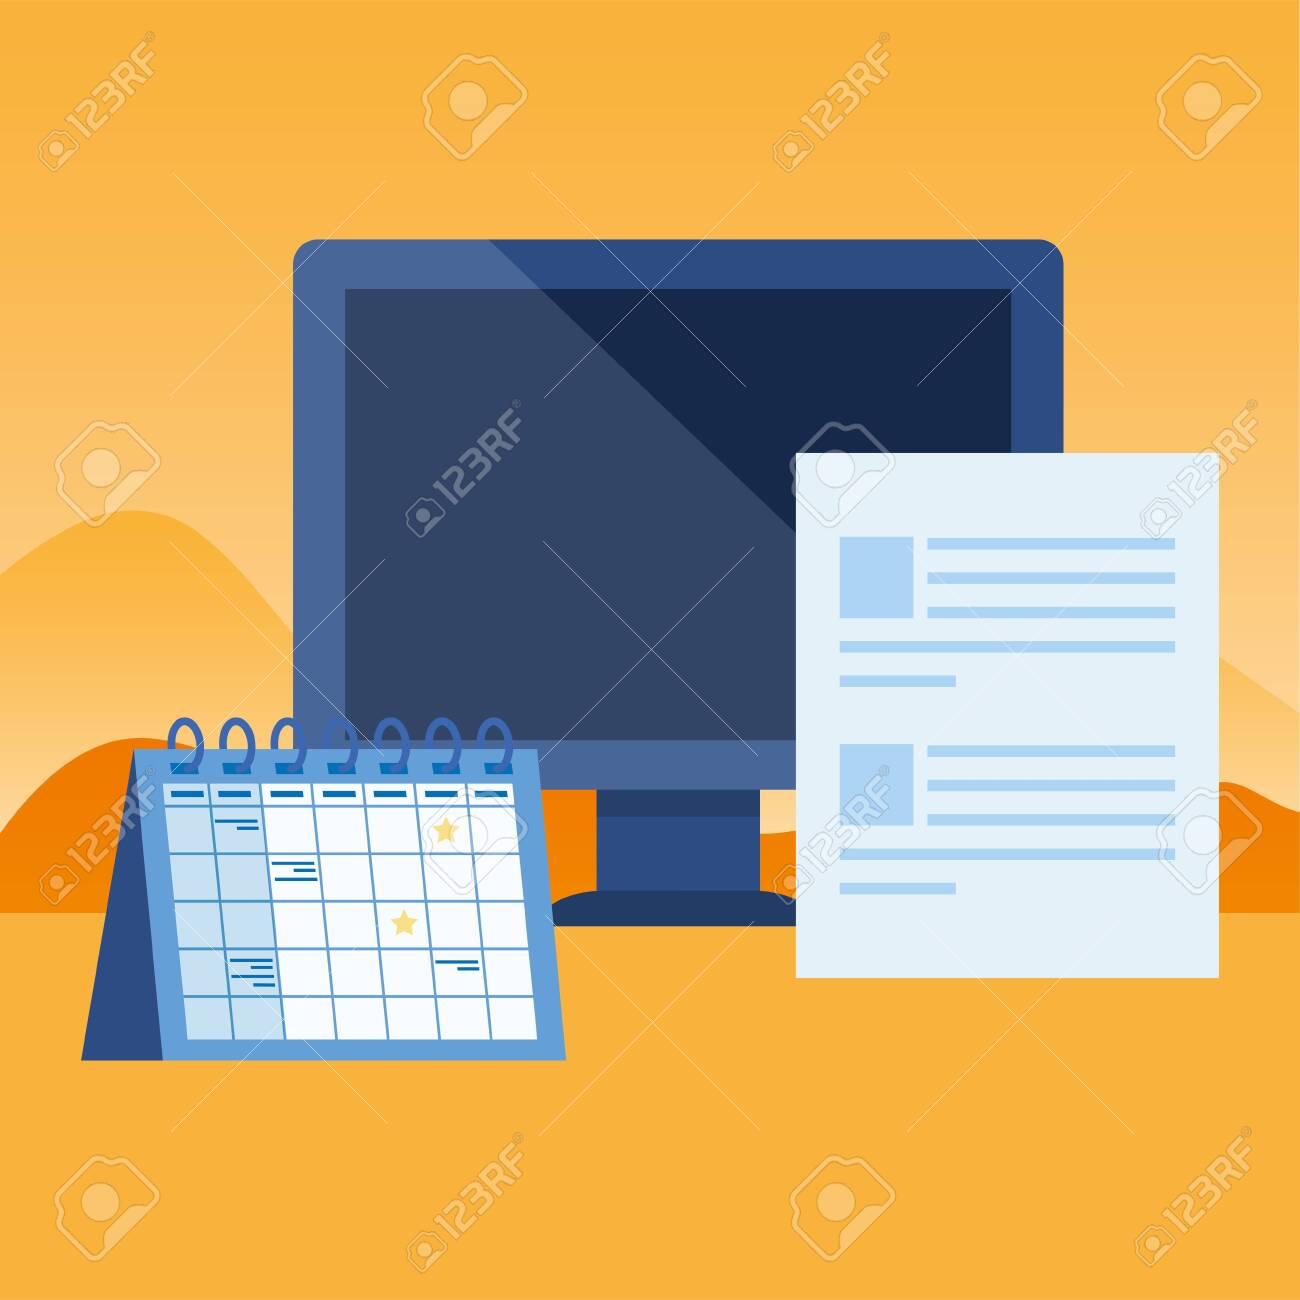 Desktop Computer With Calendar Reminder Vector Illustration Design for Calendar Reminder For Desktop